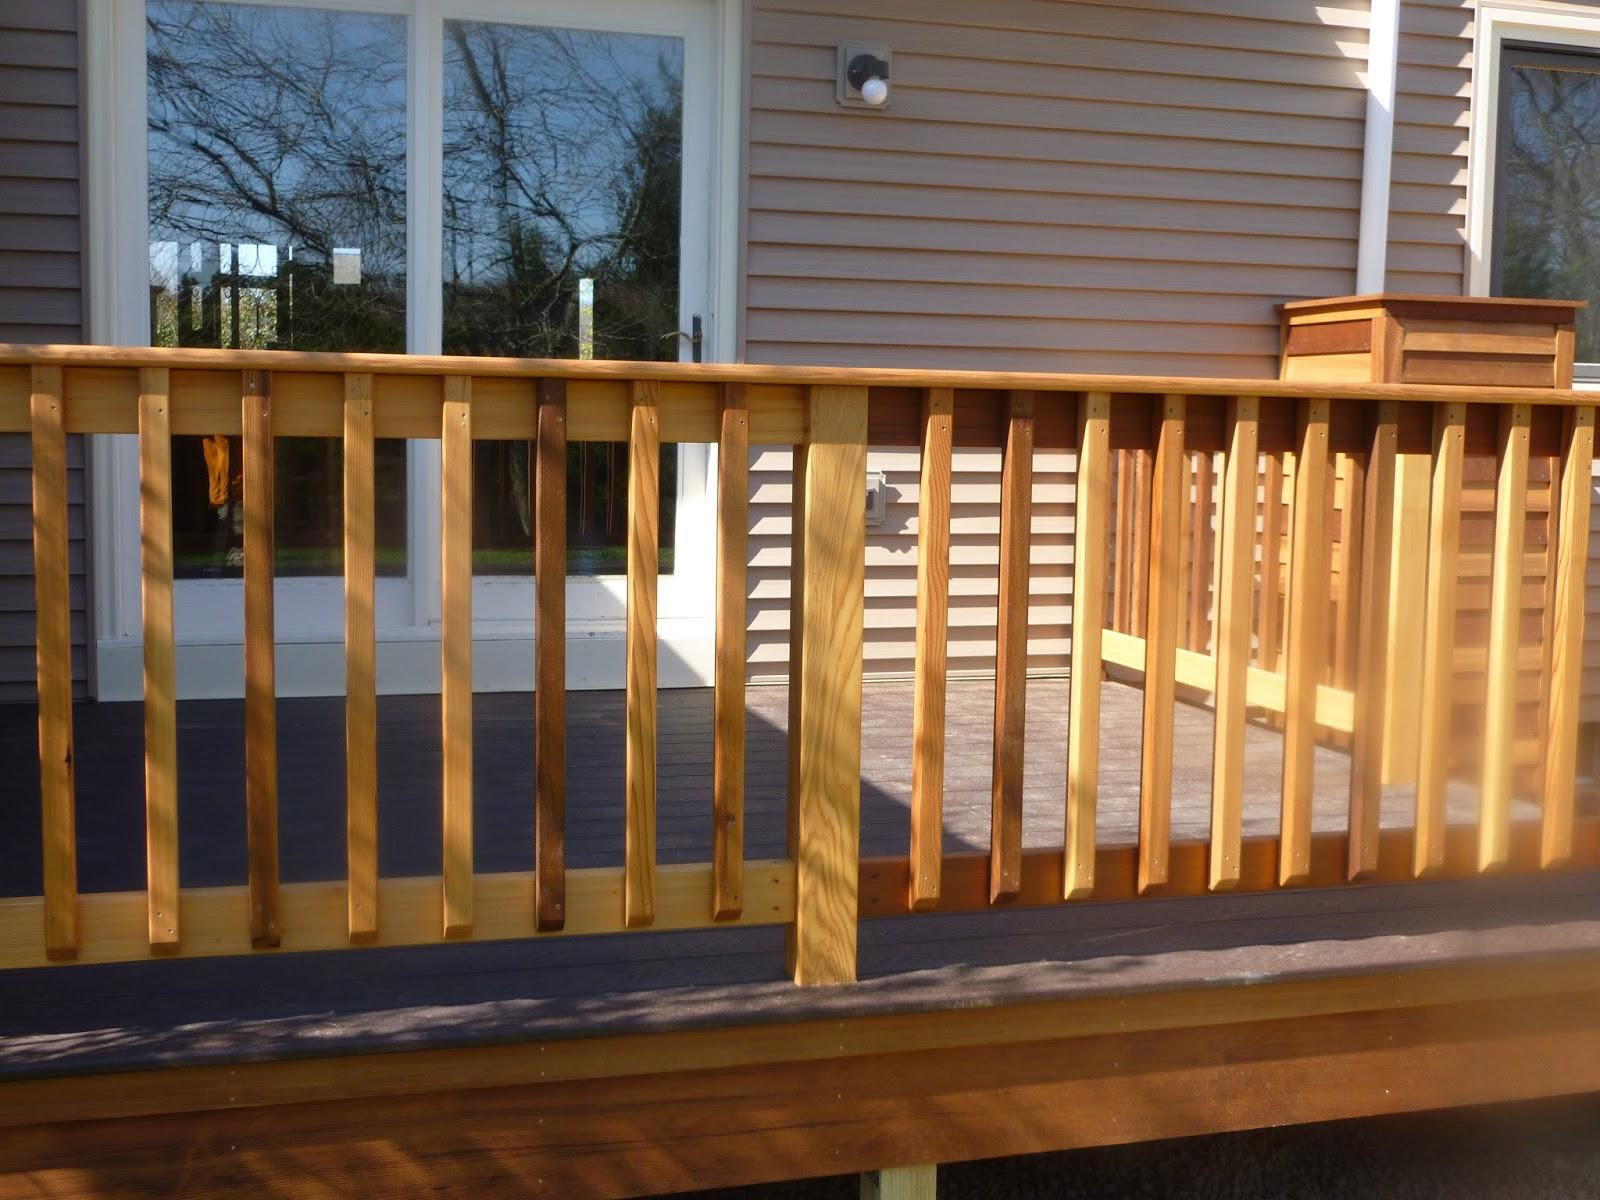 Jacob Leach Construction 802 275 8133 Renovations New | Pressure Treated Graspable Handrail